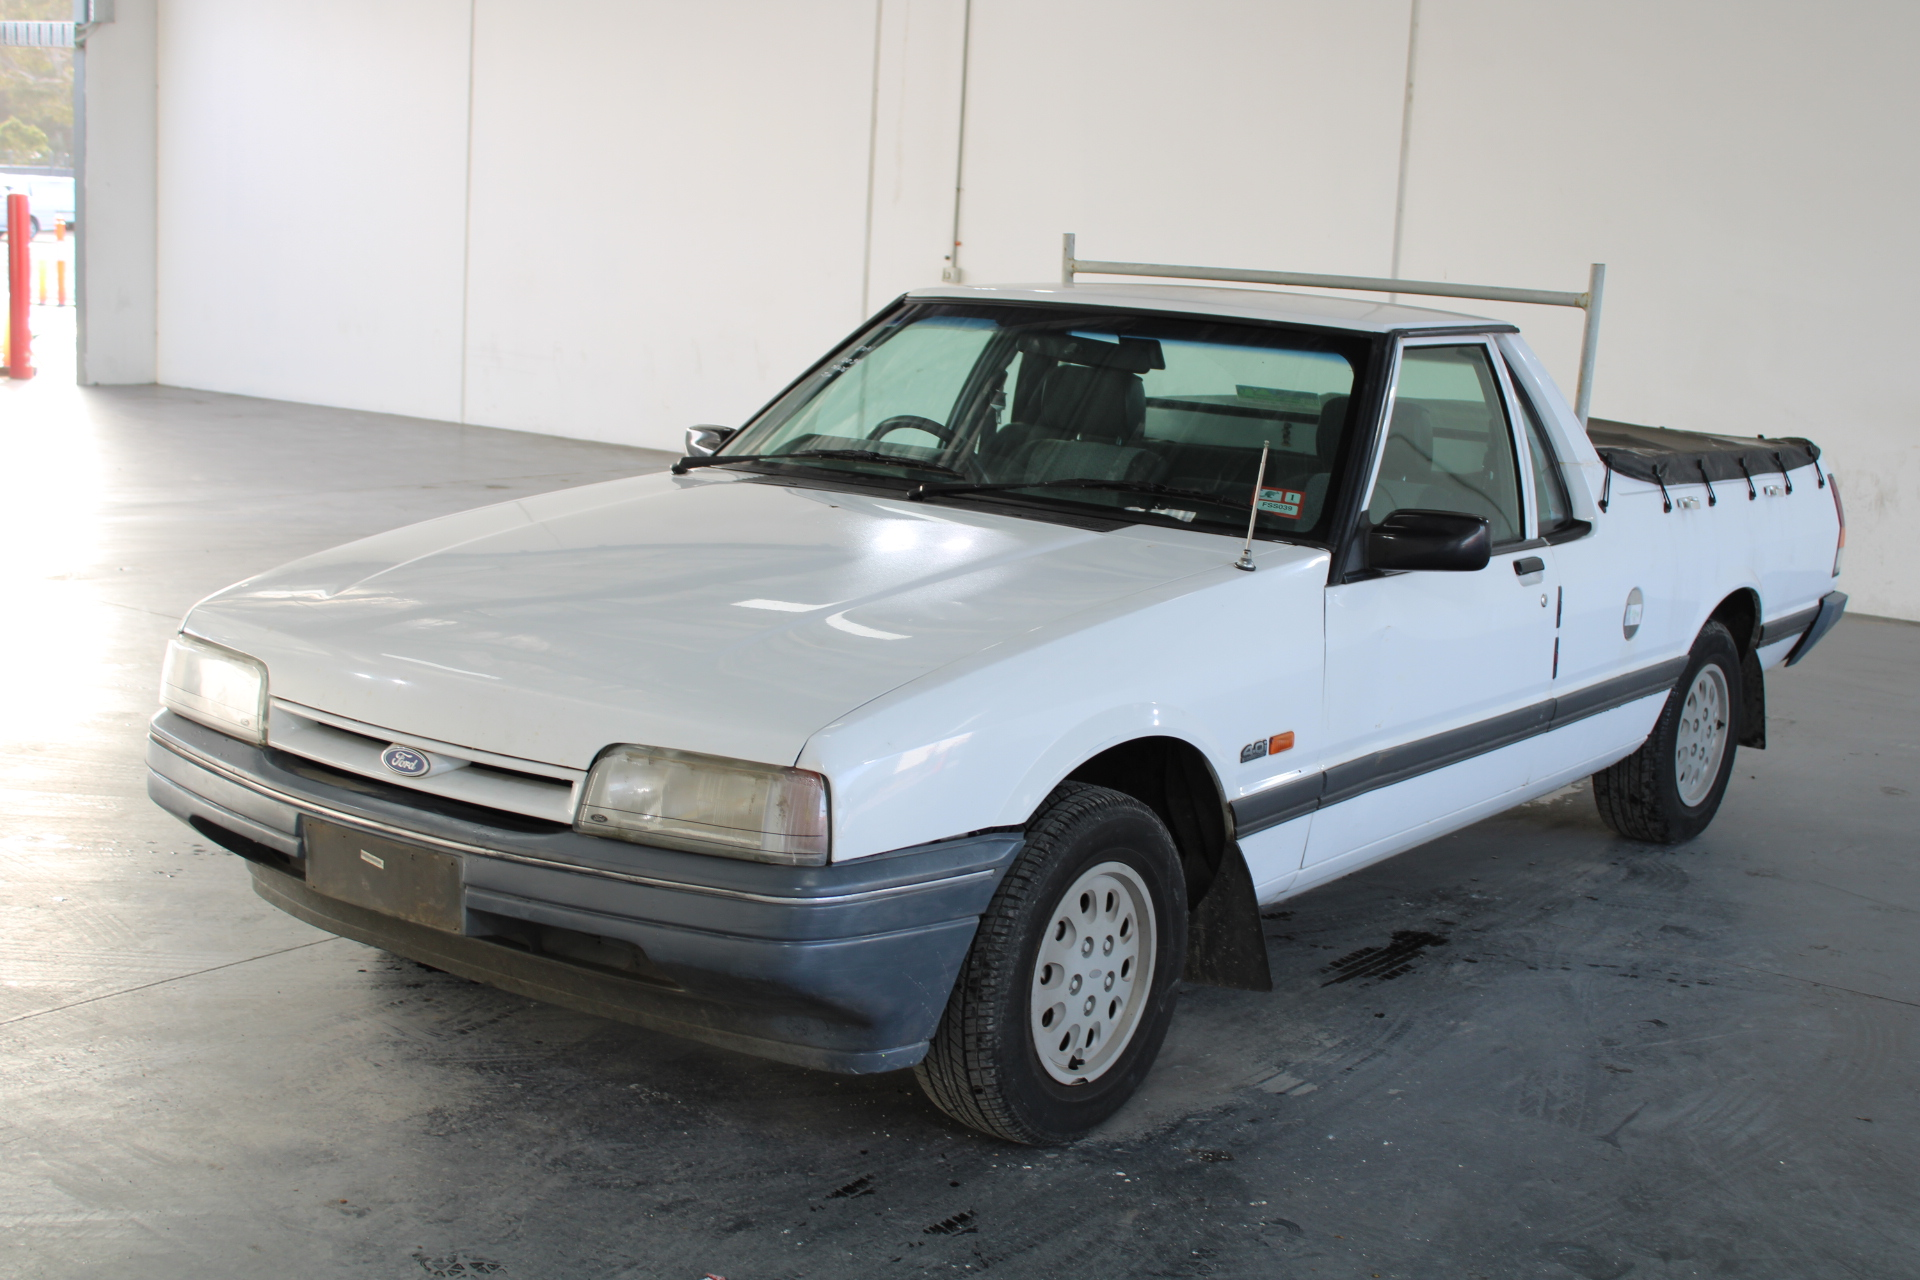 1994 Ford Falcon GLi Longreach XG Automatic Ute